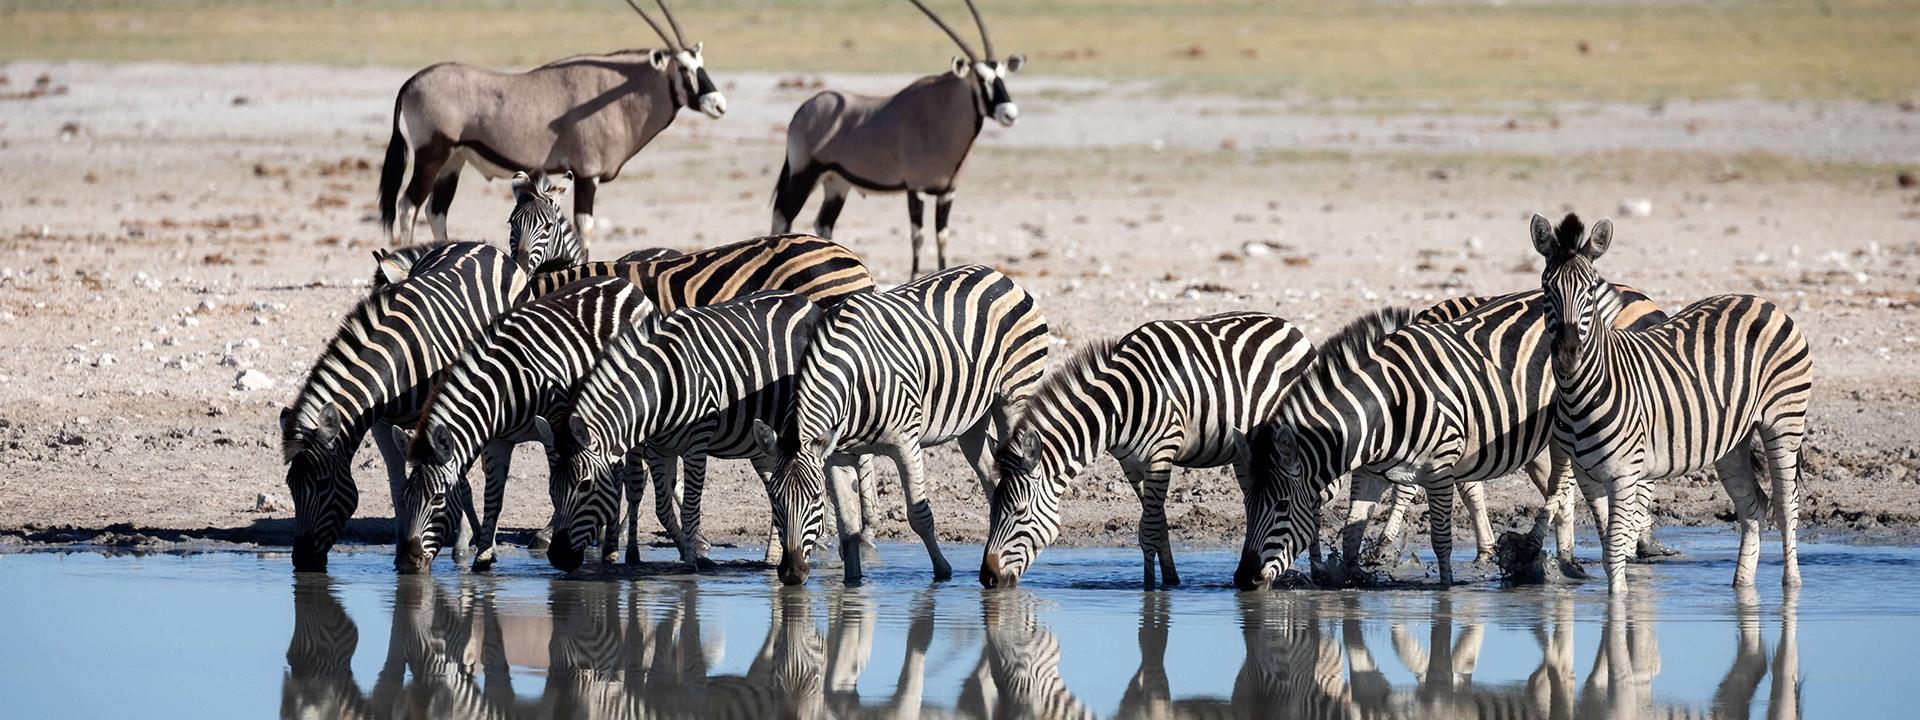 Titel_1_Urlaubs_Ranger_Kalahari_Elela_Africa-wide